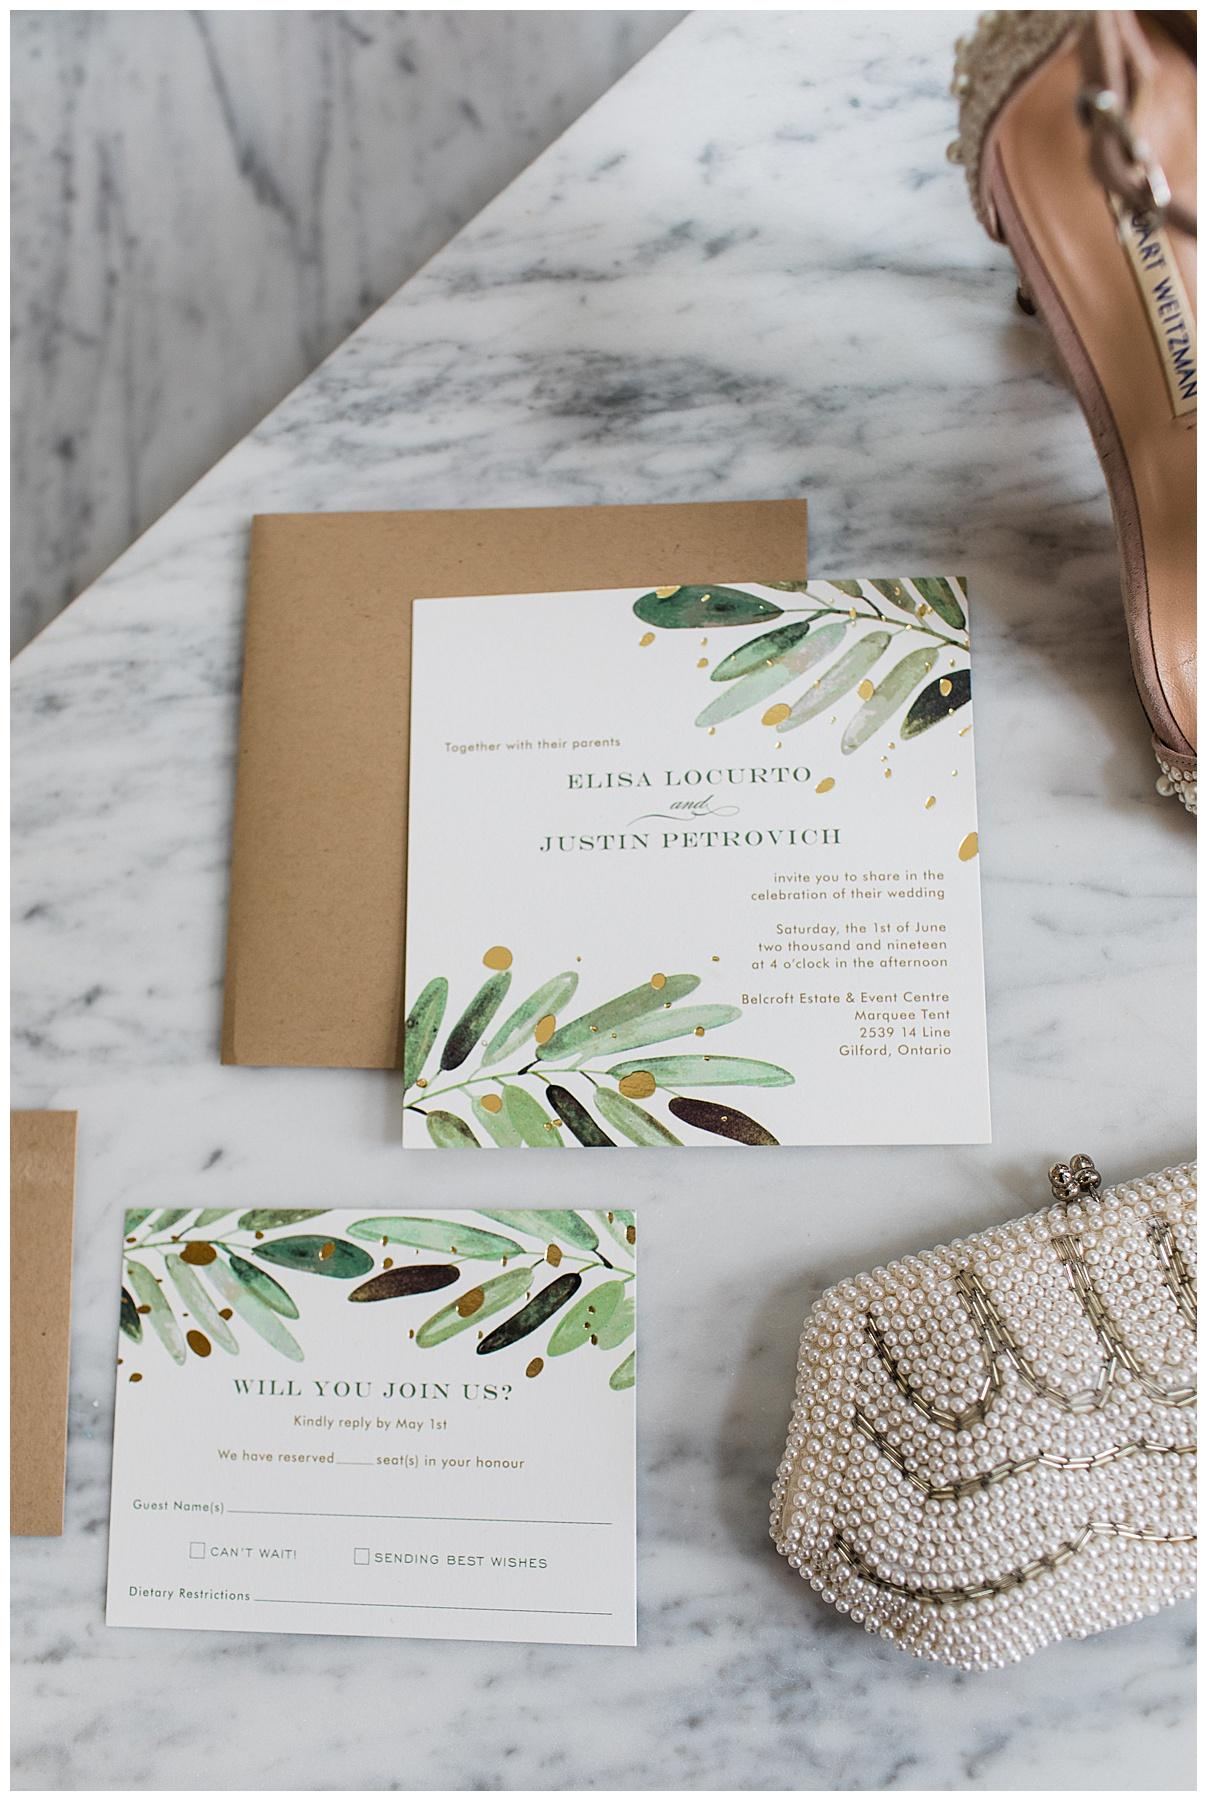 Leafy wedding invitations| Belcroft Estate Wedding| Toronto wedding photographer| Ontario wedding photographer| 3photography